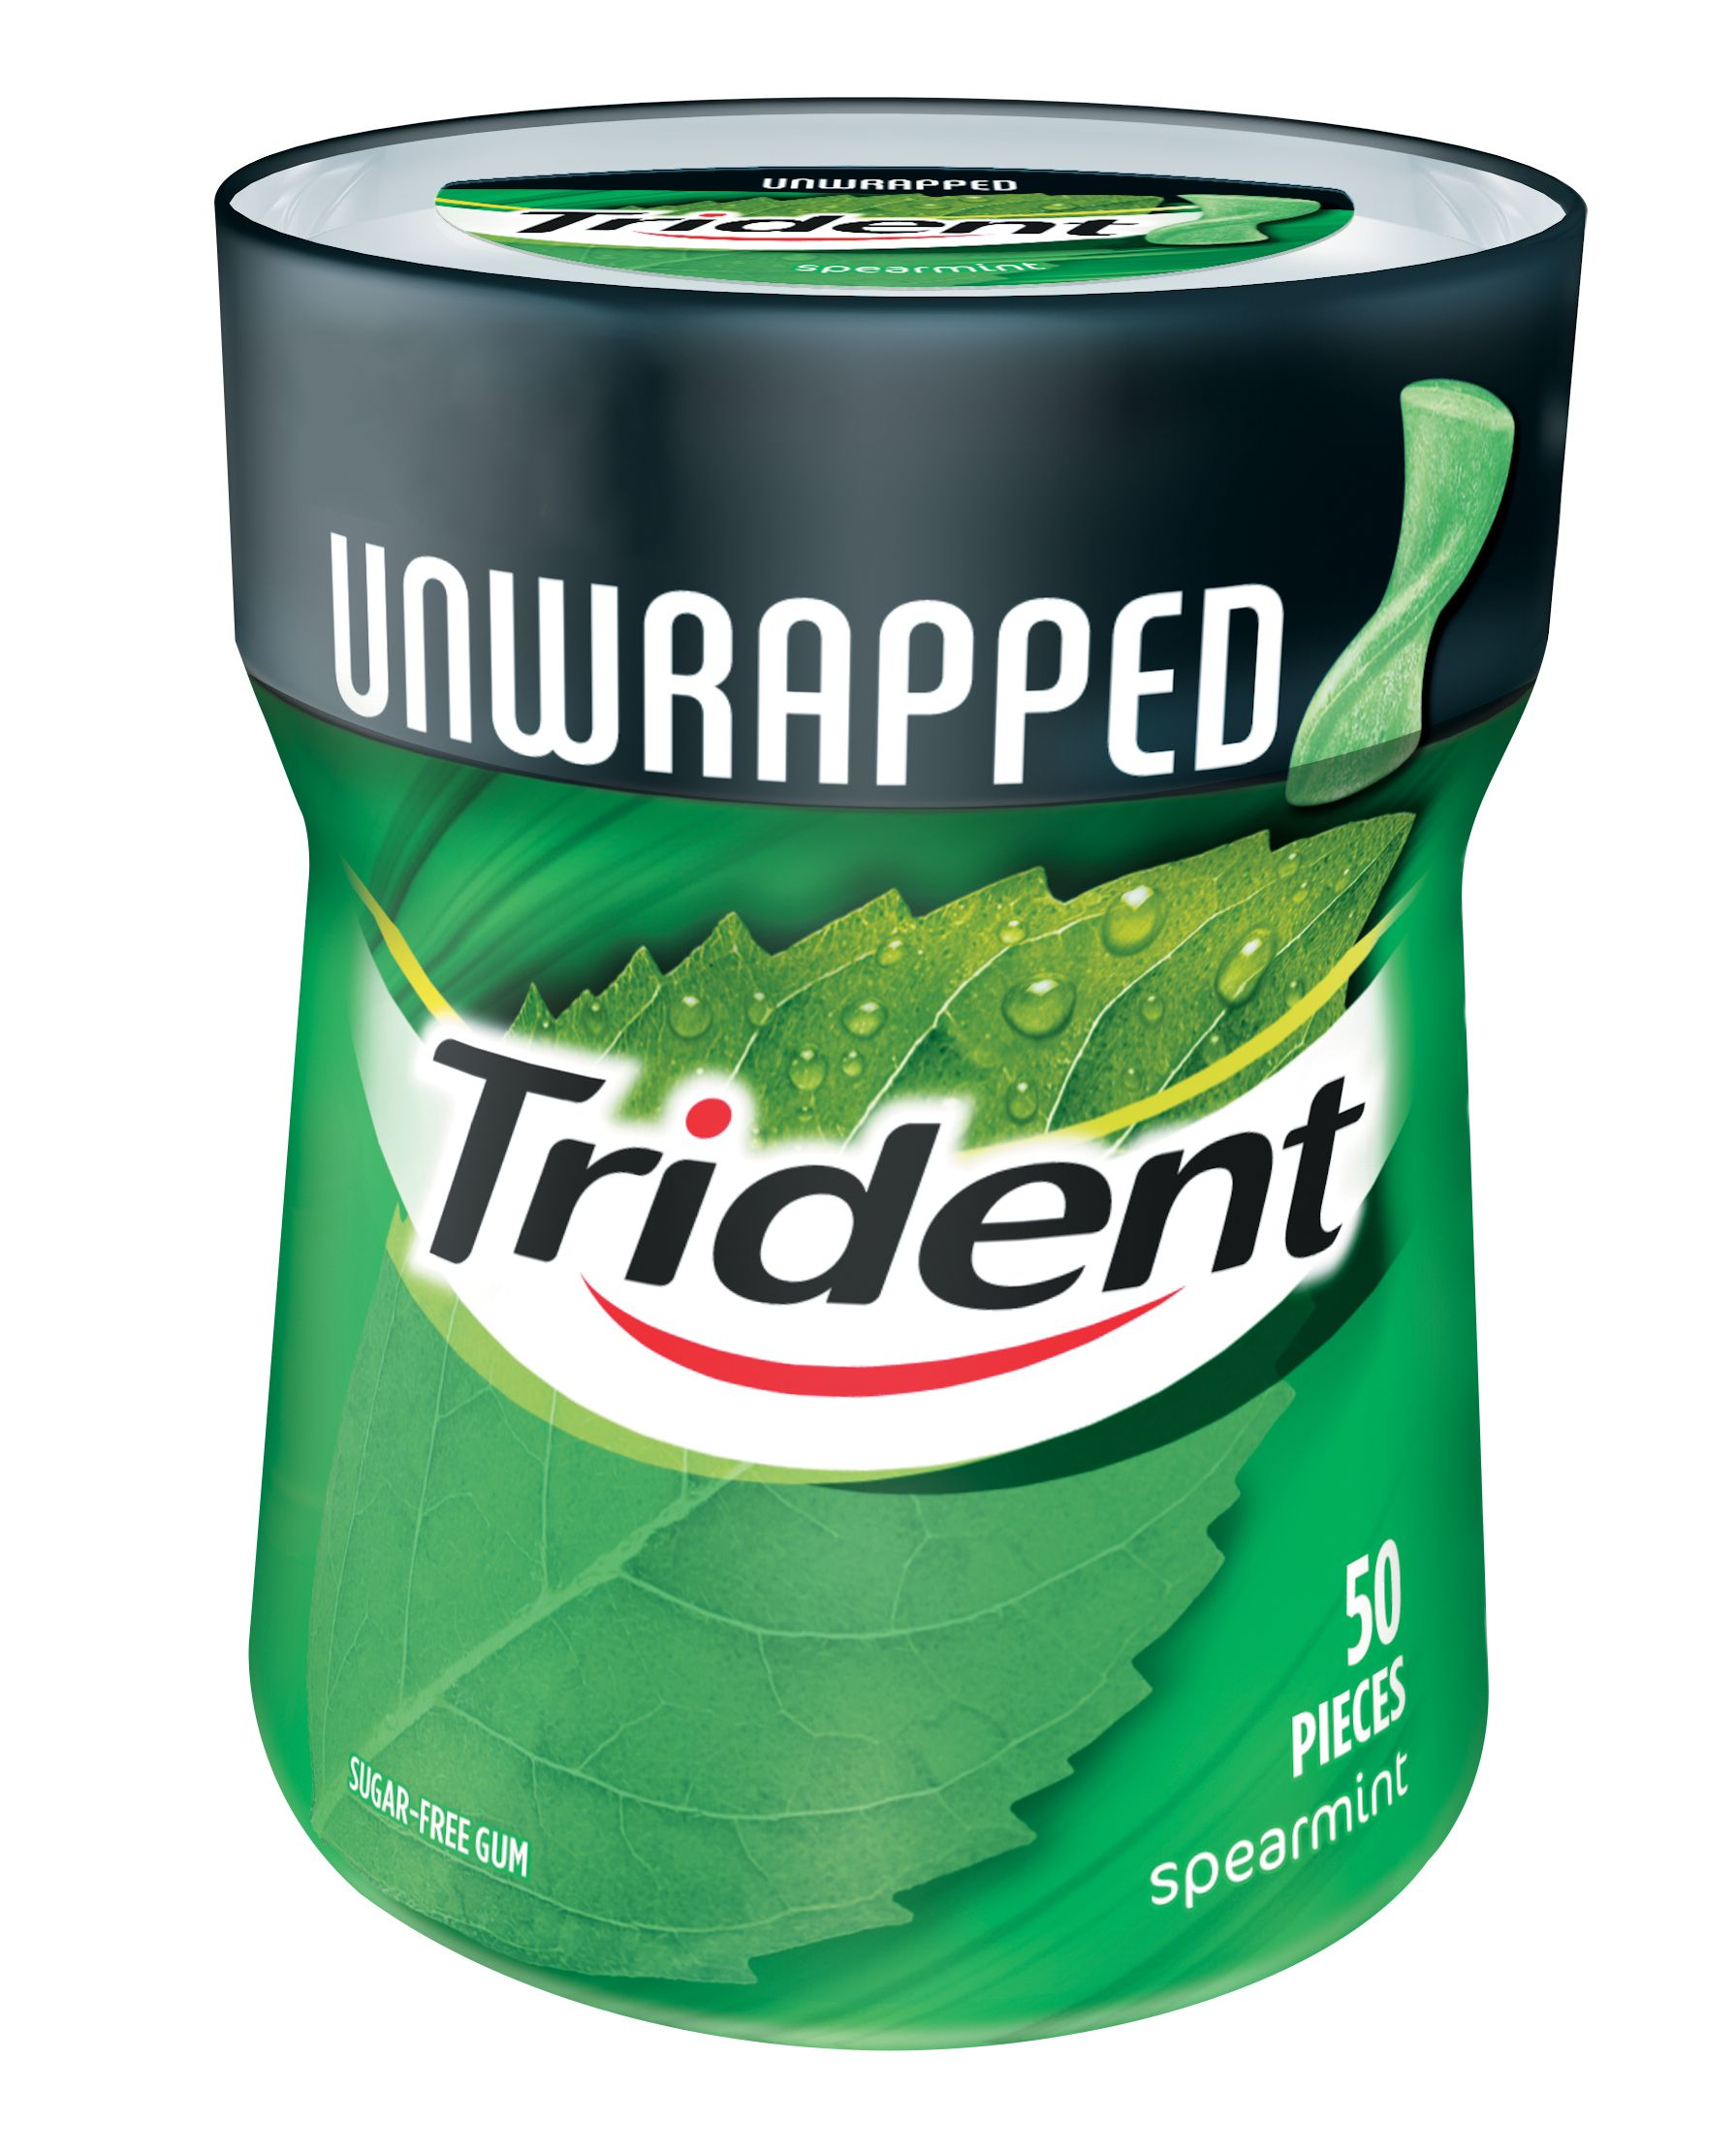 TRIDENT  SPEARMINT 50 1N